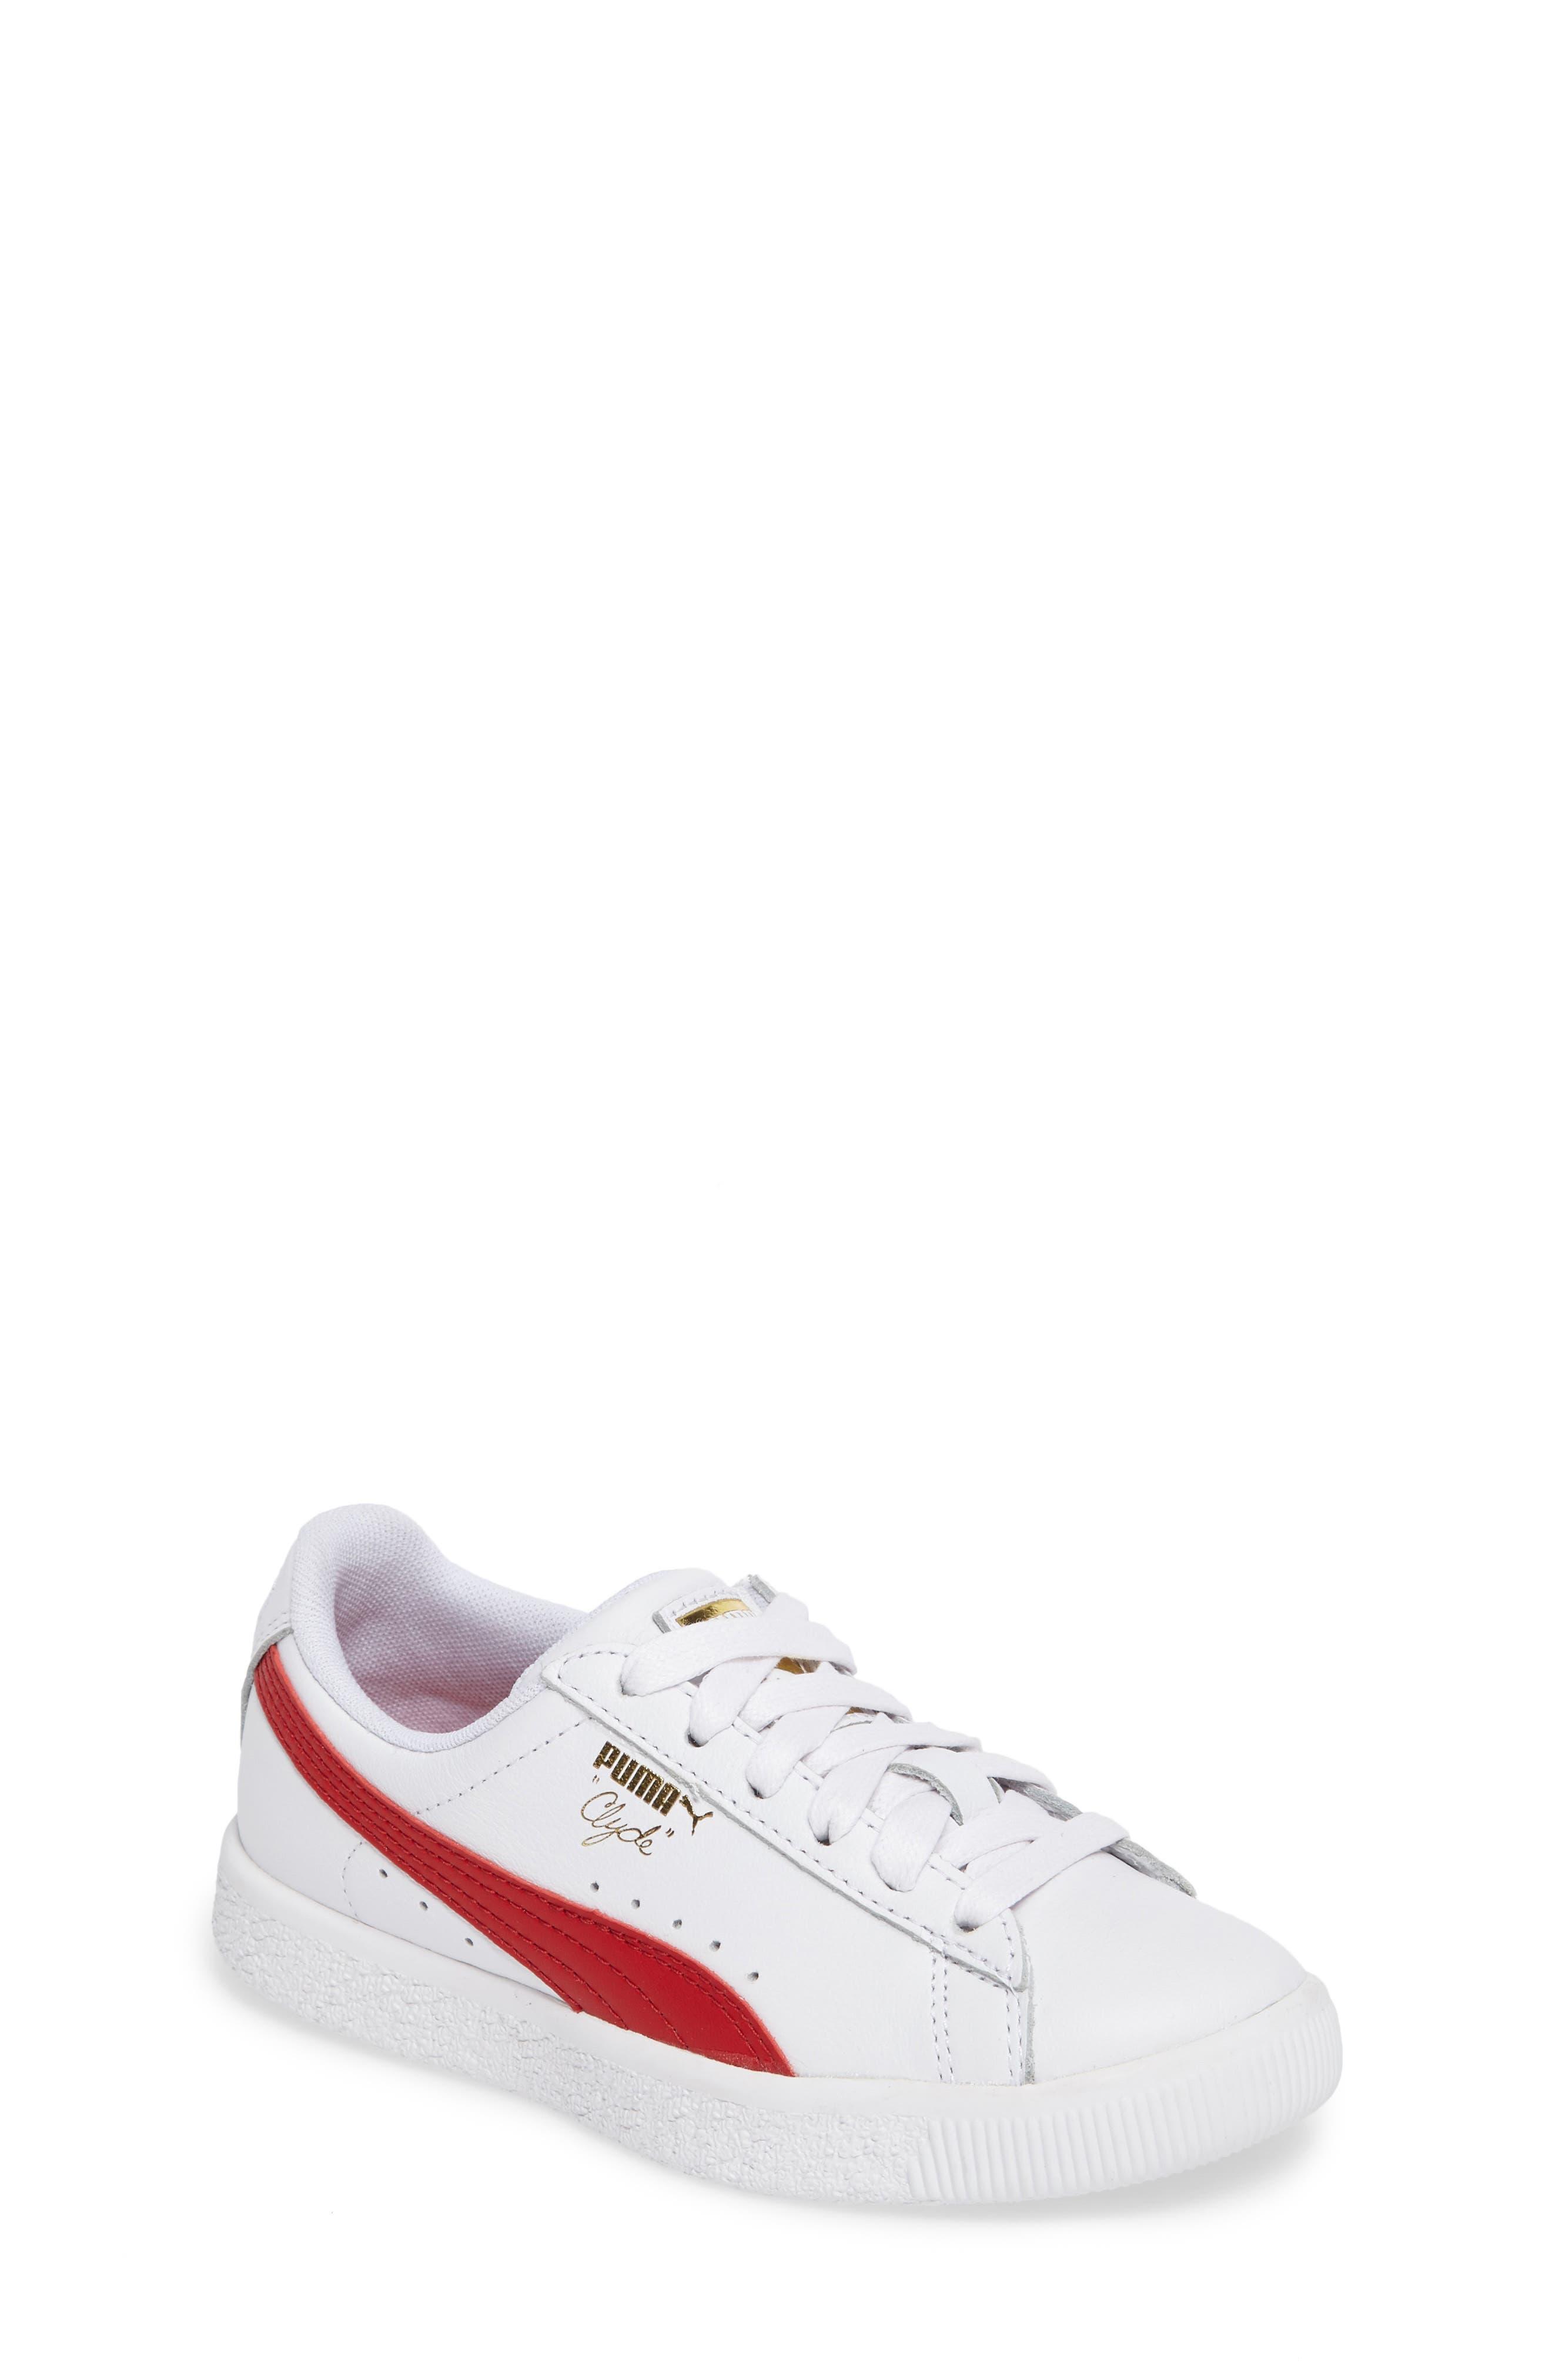 Clyde Core Foil Sneaker,                         Main,                         color, White/ Cherry